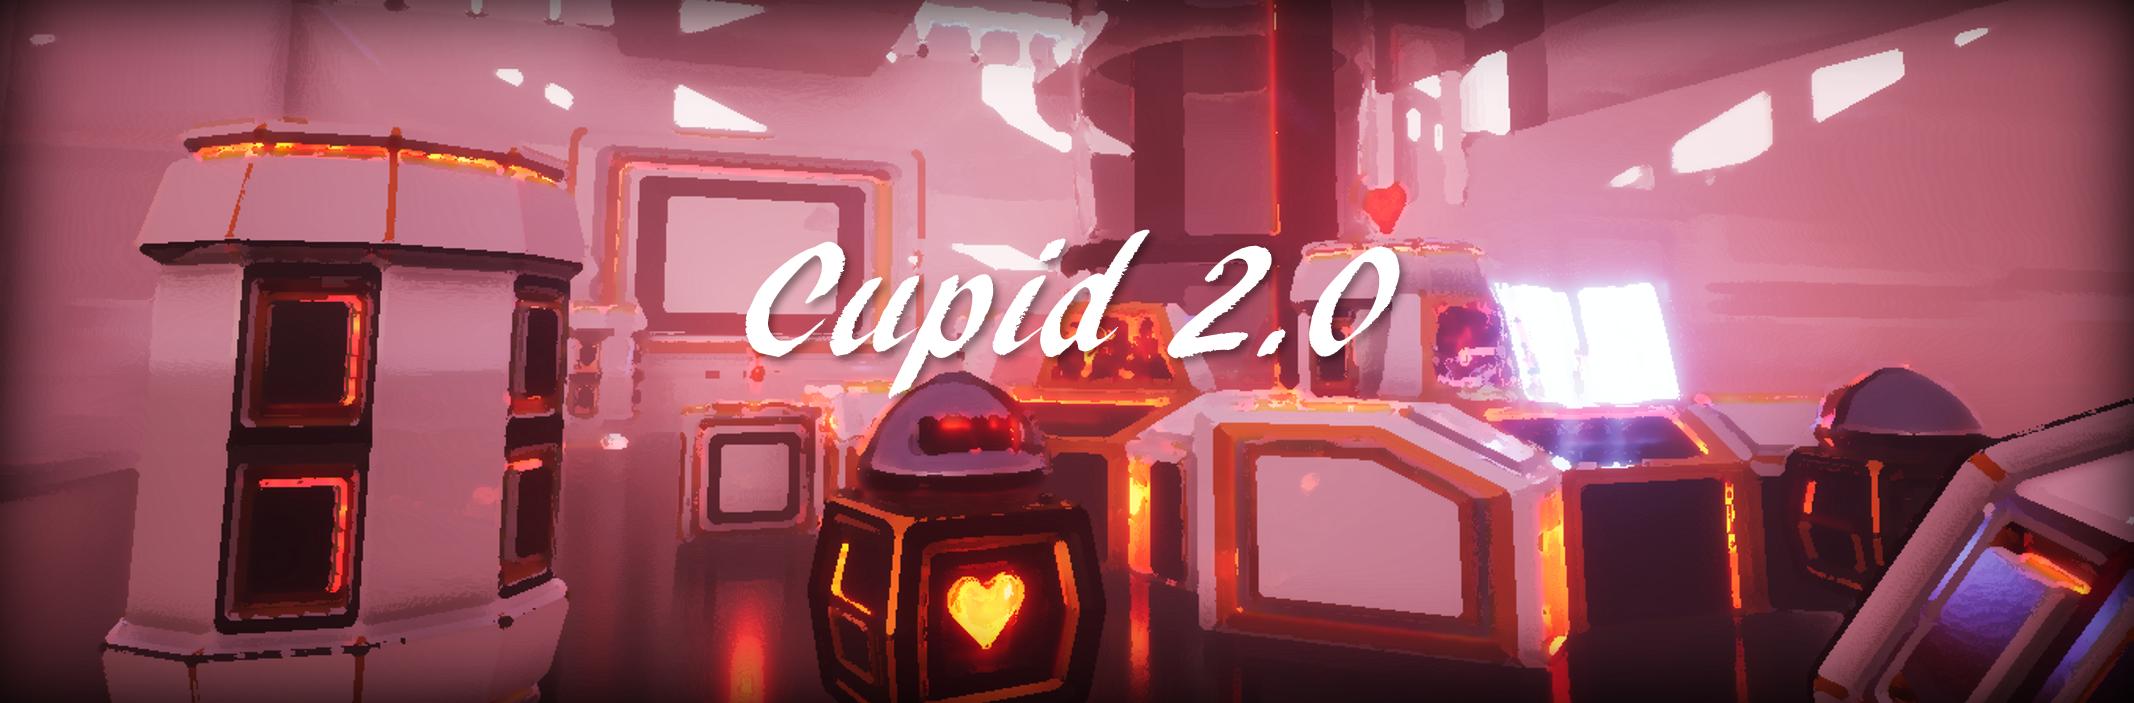 Cupid 2.0